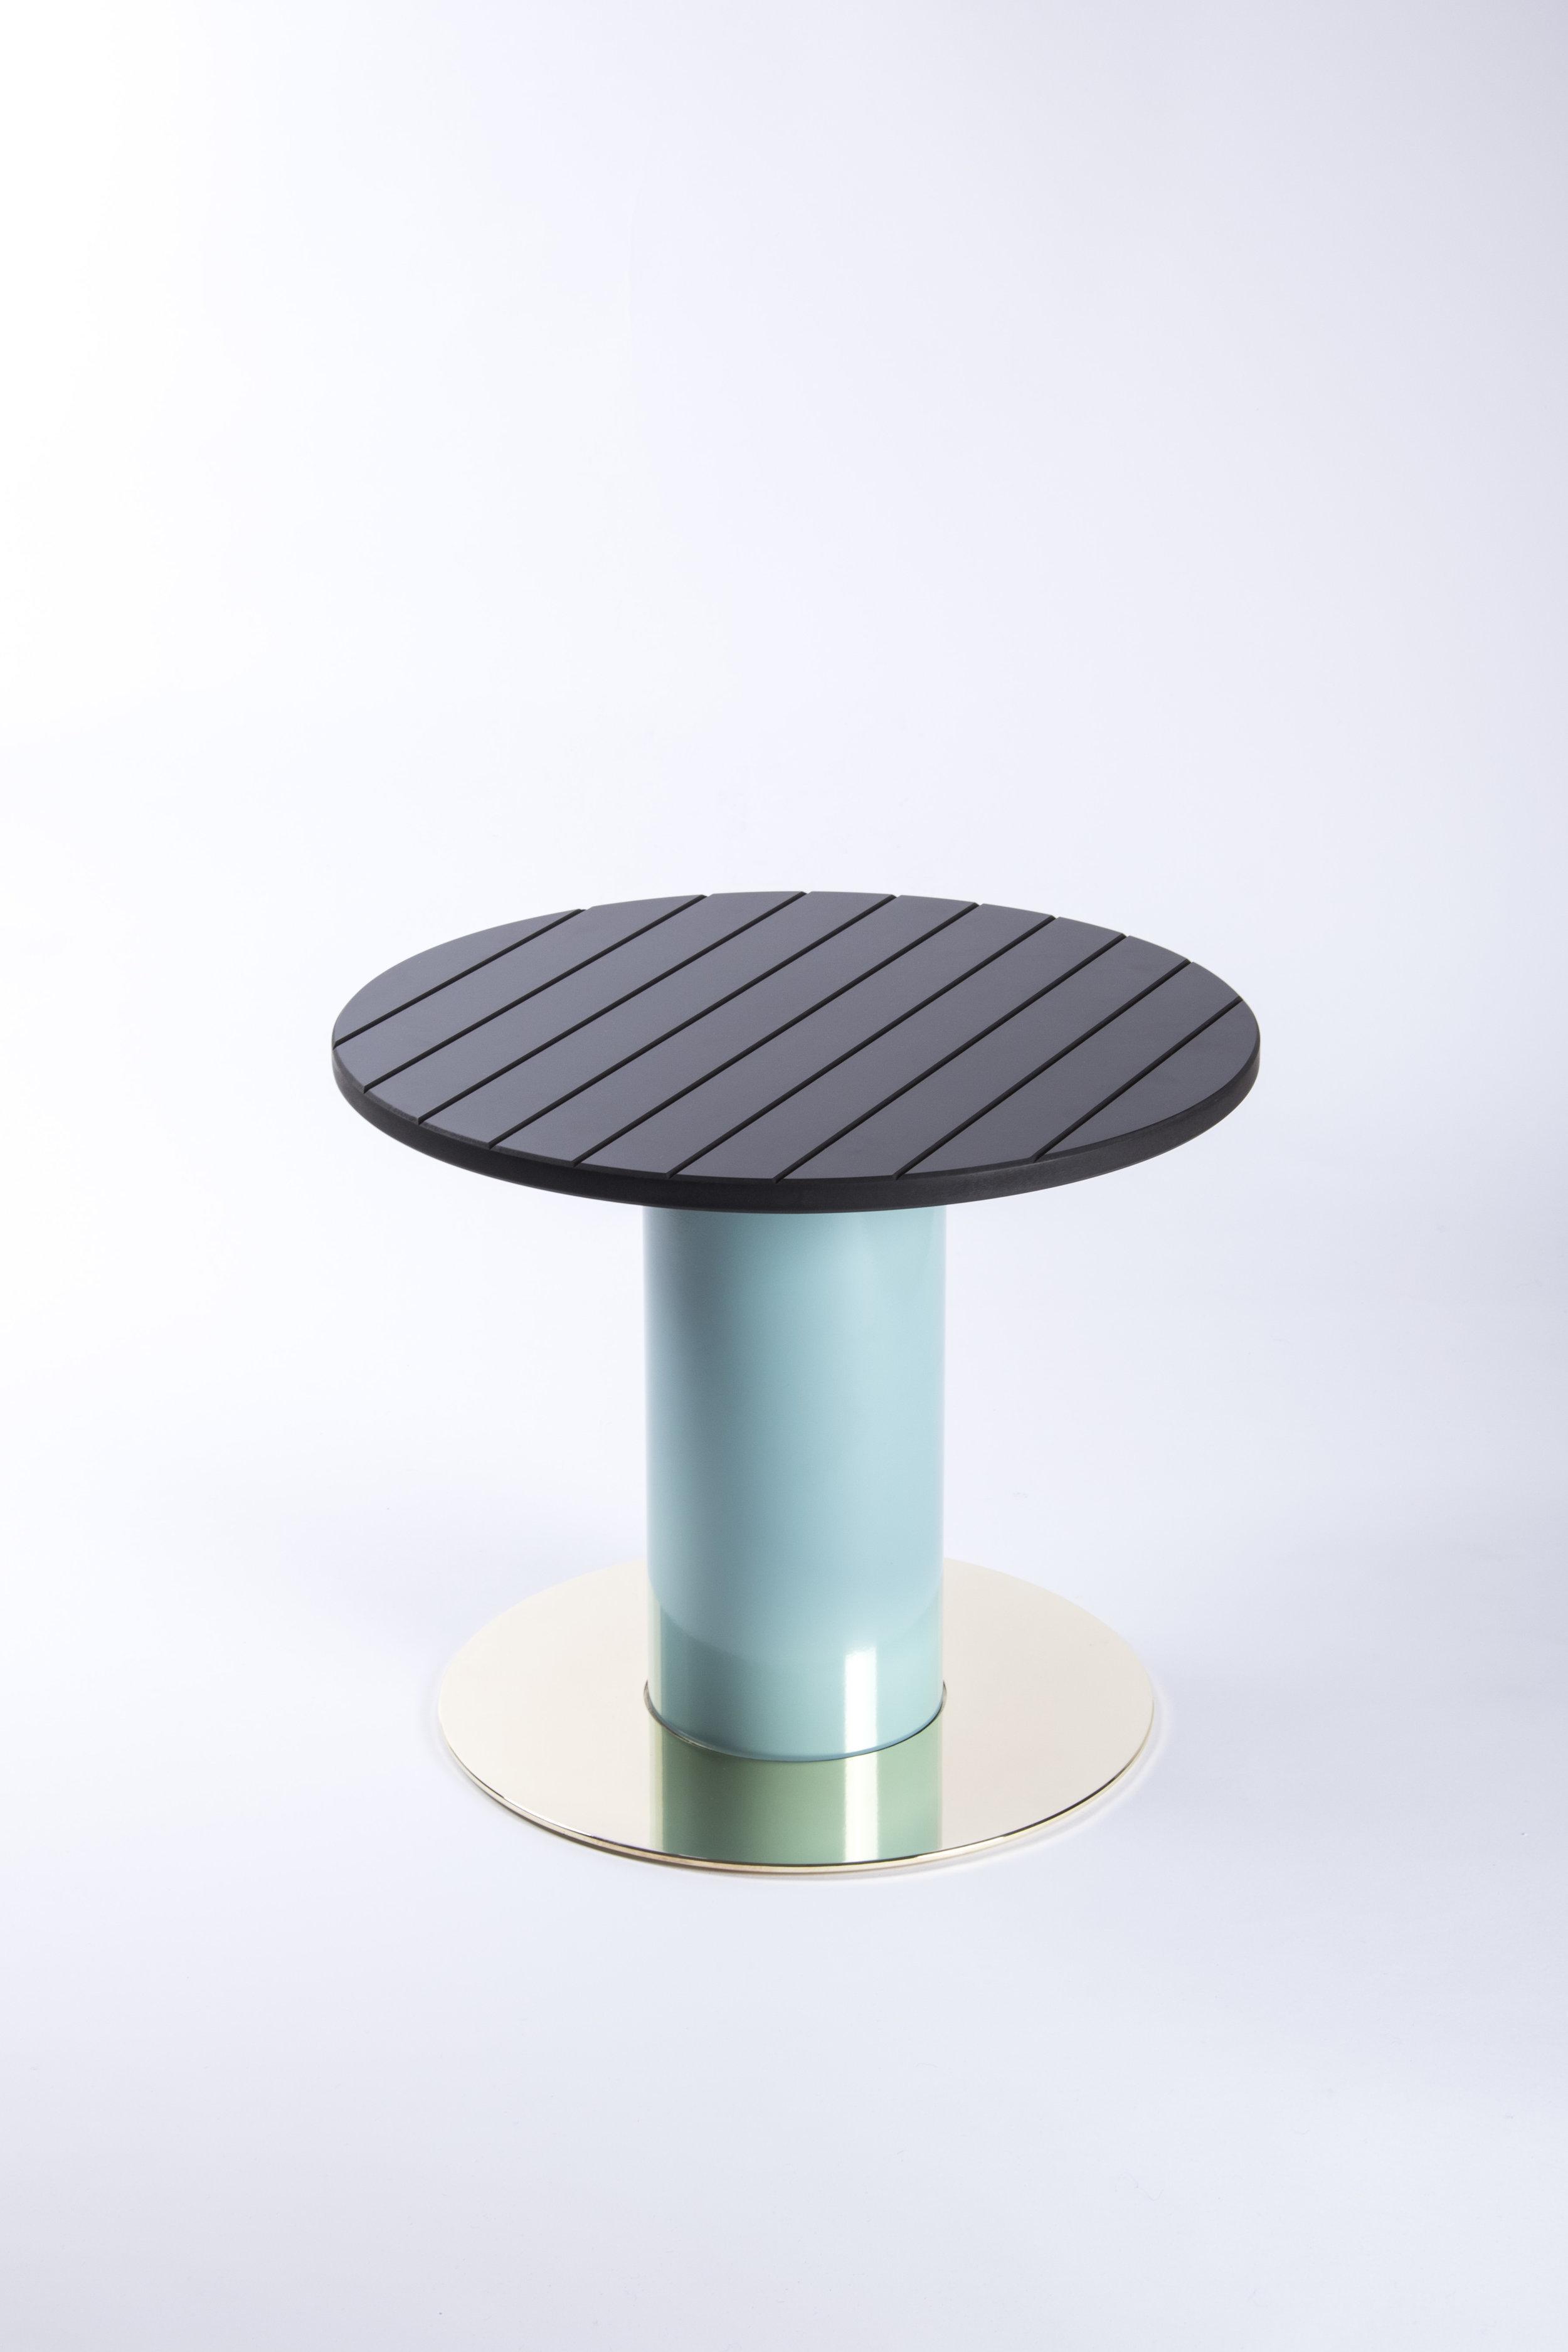 Reel Side Tables - David Derksen Design07.jpg